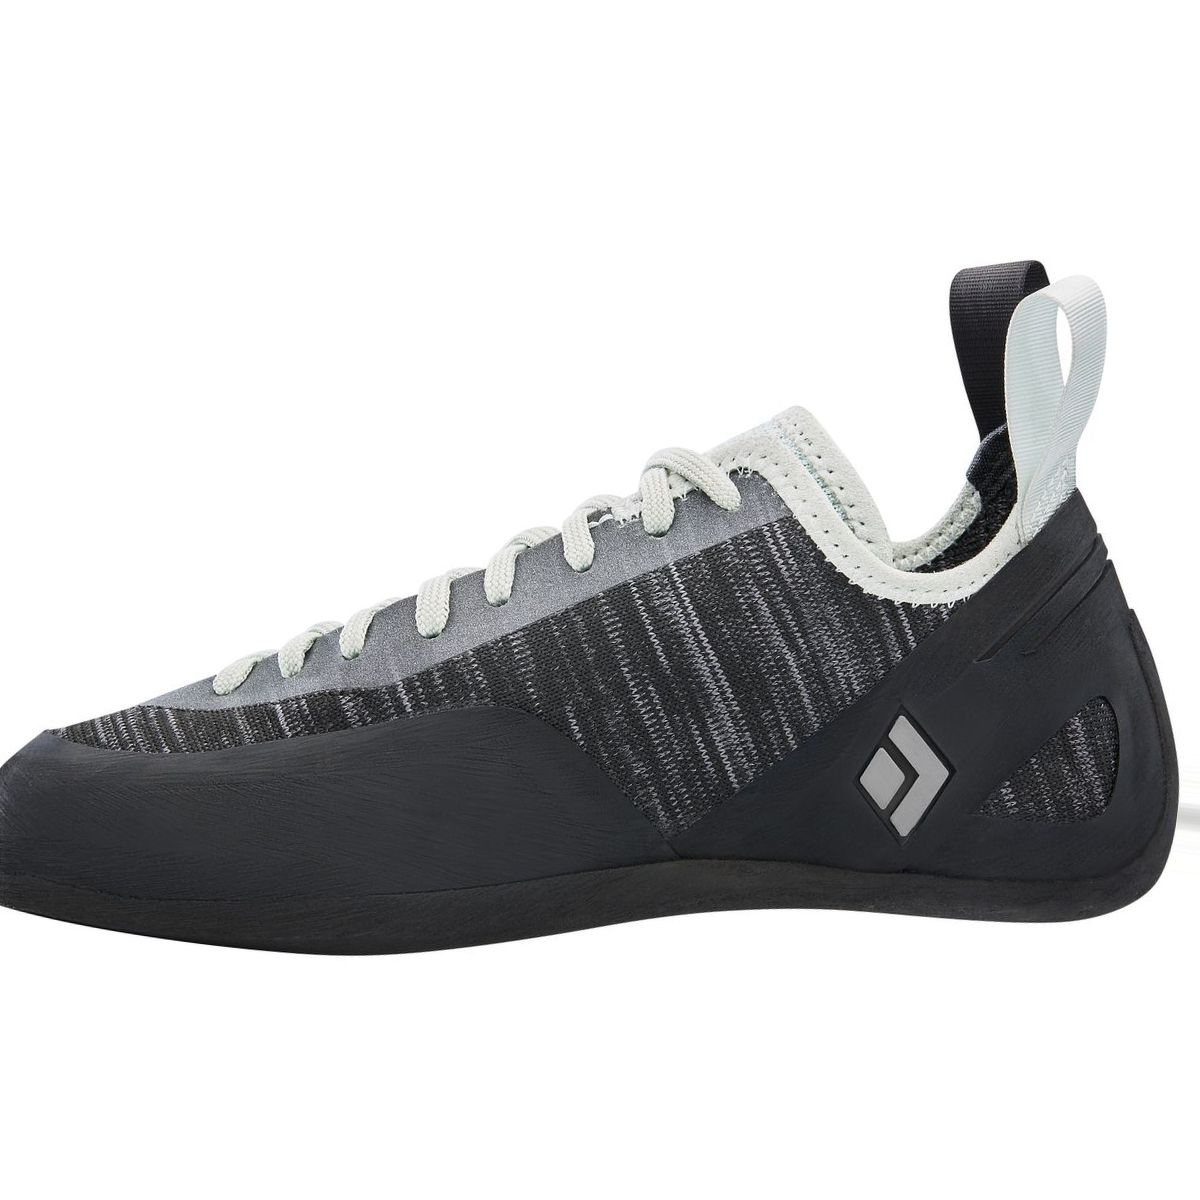 Black Diamond Momentum Lace Climbing Shoe - Women's